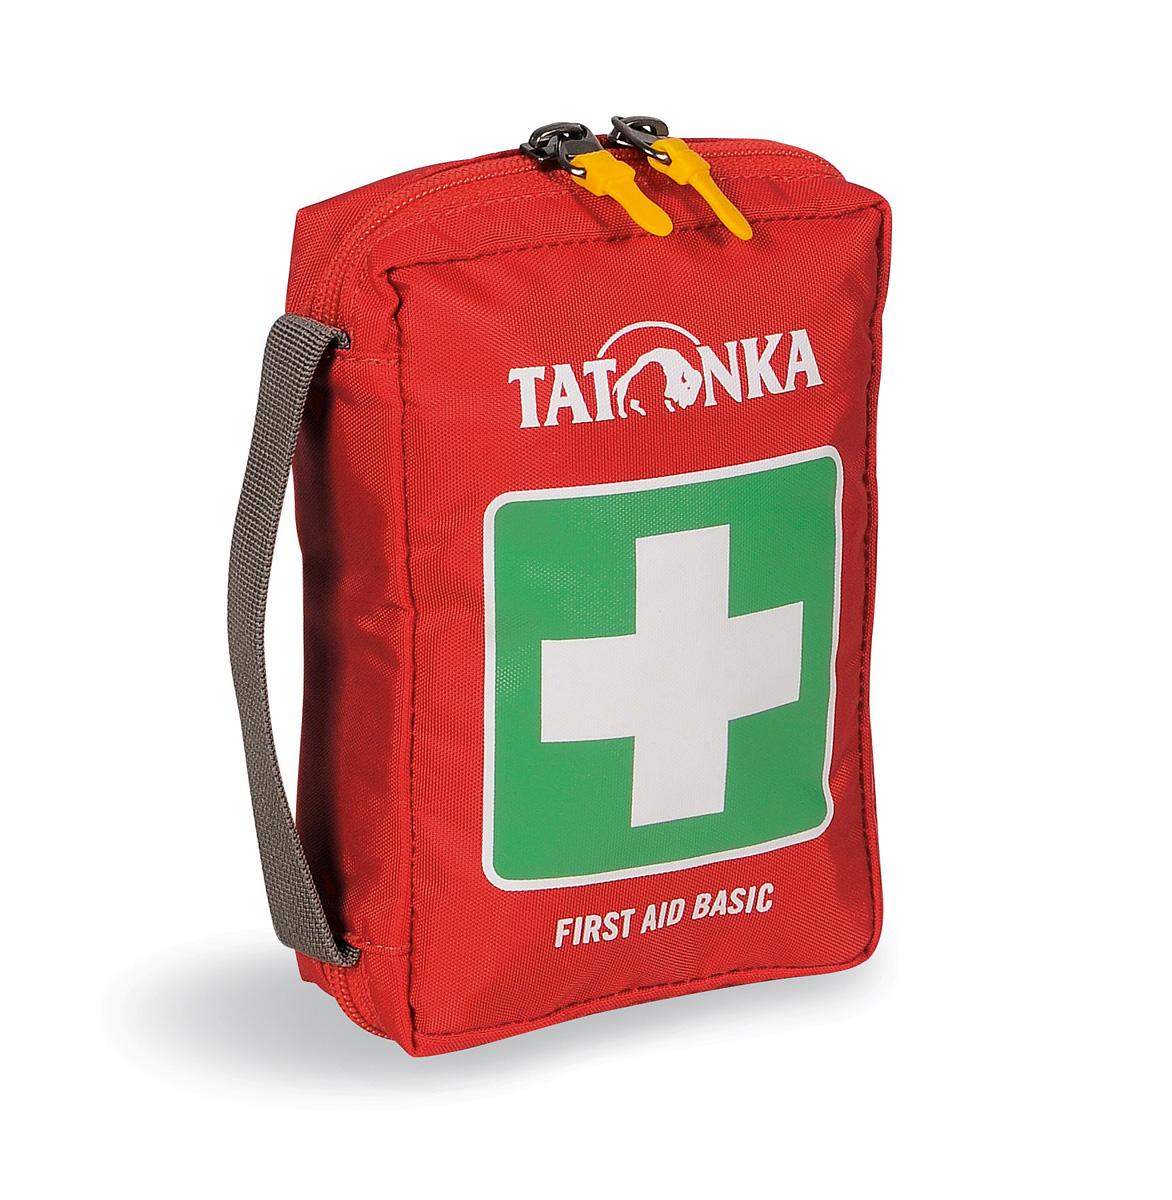 tatonka first aid basic erste hilfe set 13 teilig pda max. Black Bedroom Furniture Sets. Home Design Ideas